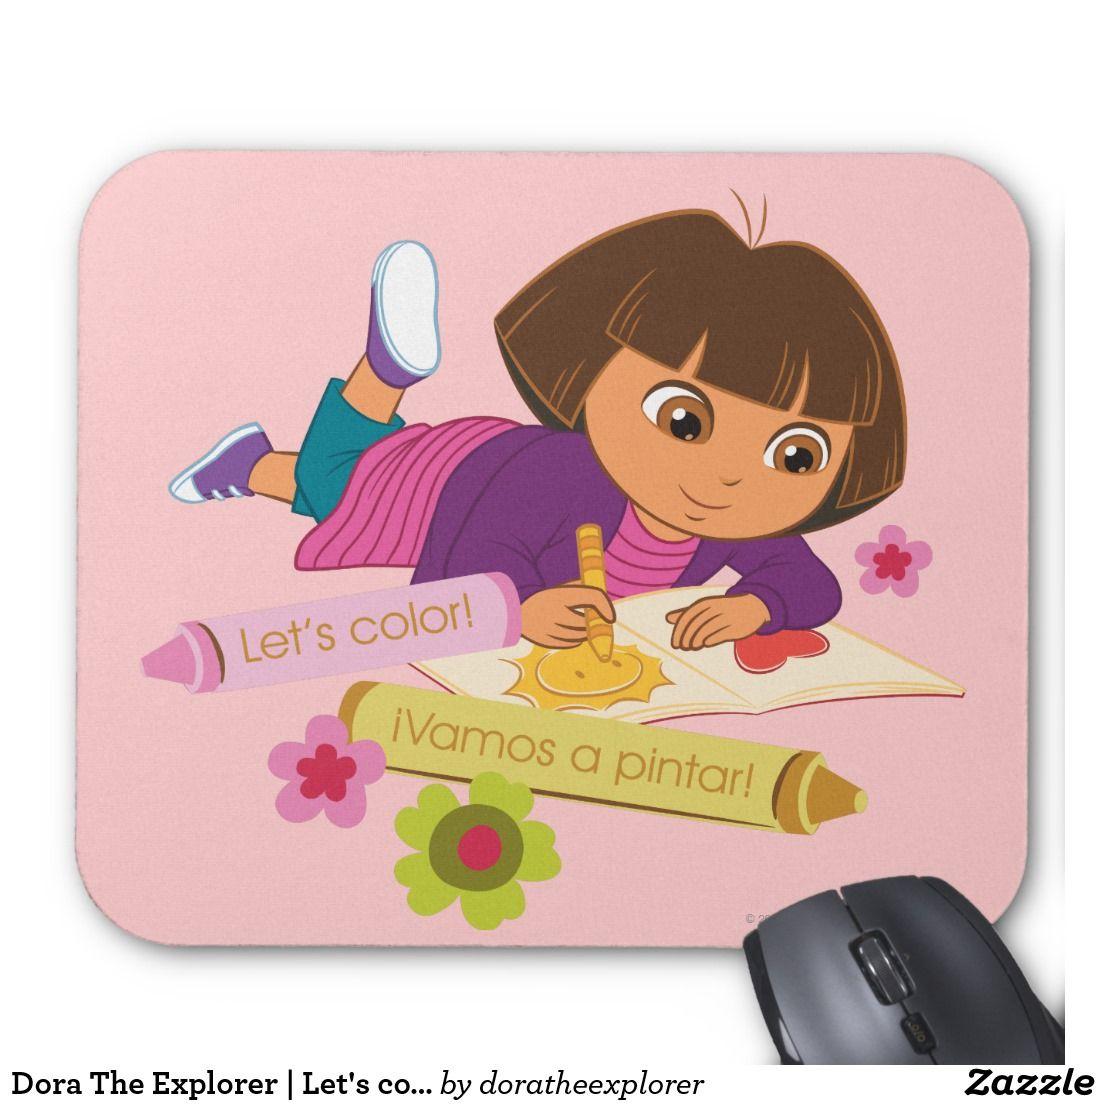 Dora The Explorer | Let's color! ¡Vamos a pintar! Producto ...